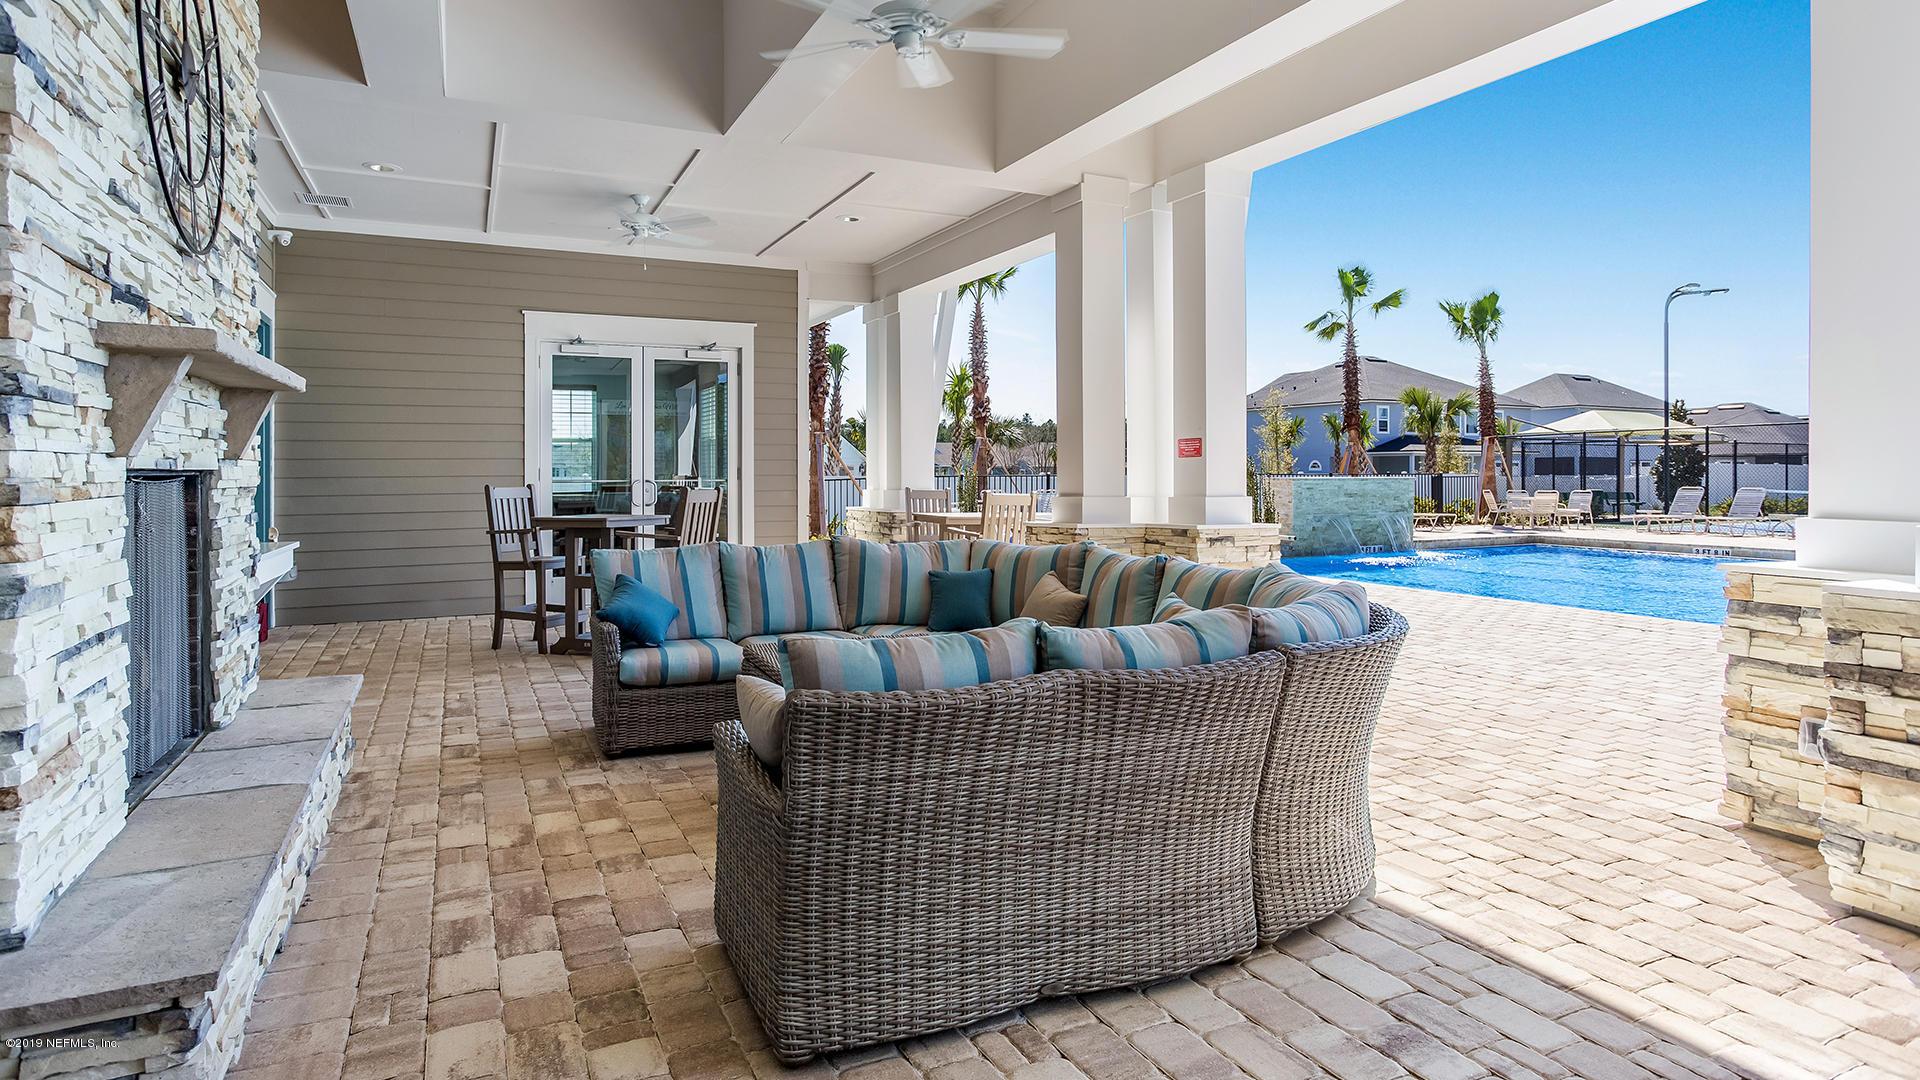 3708 BAXTER, JACKSONVILLE, FLORIDA 32222, 3 Bedrooms Bedrooms, ,2 BathroomsBathrooms,Residential,For sale,BAXTER,1044657